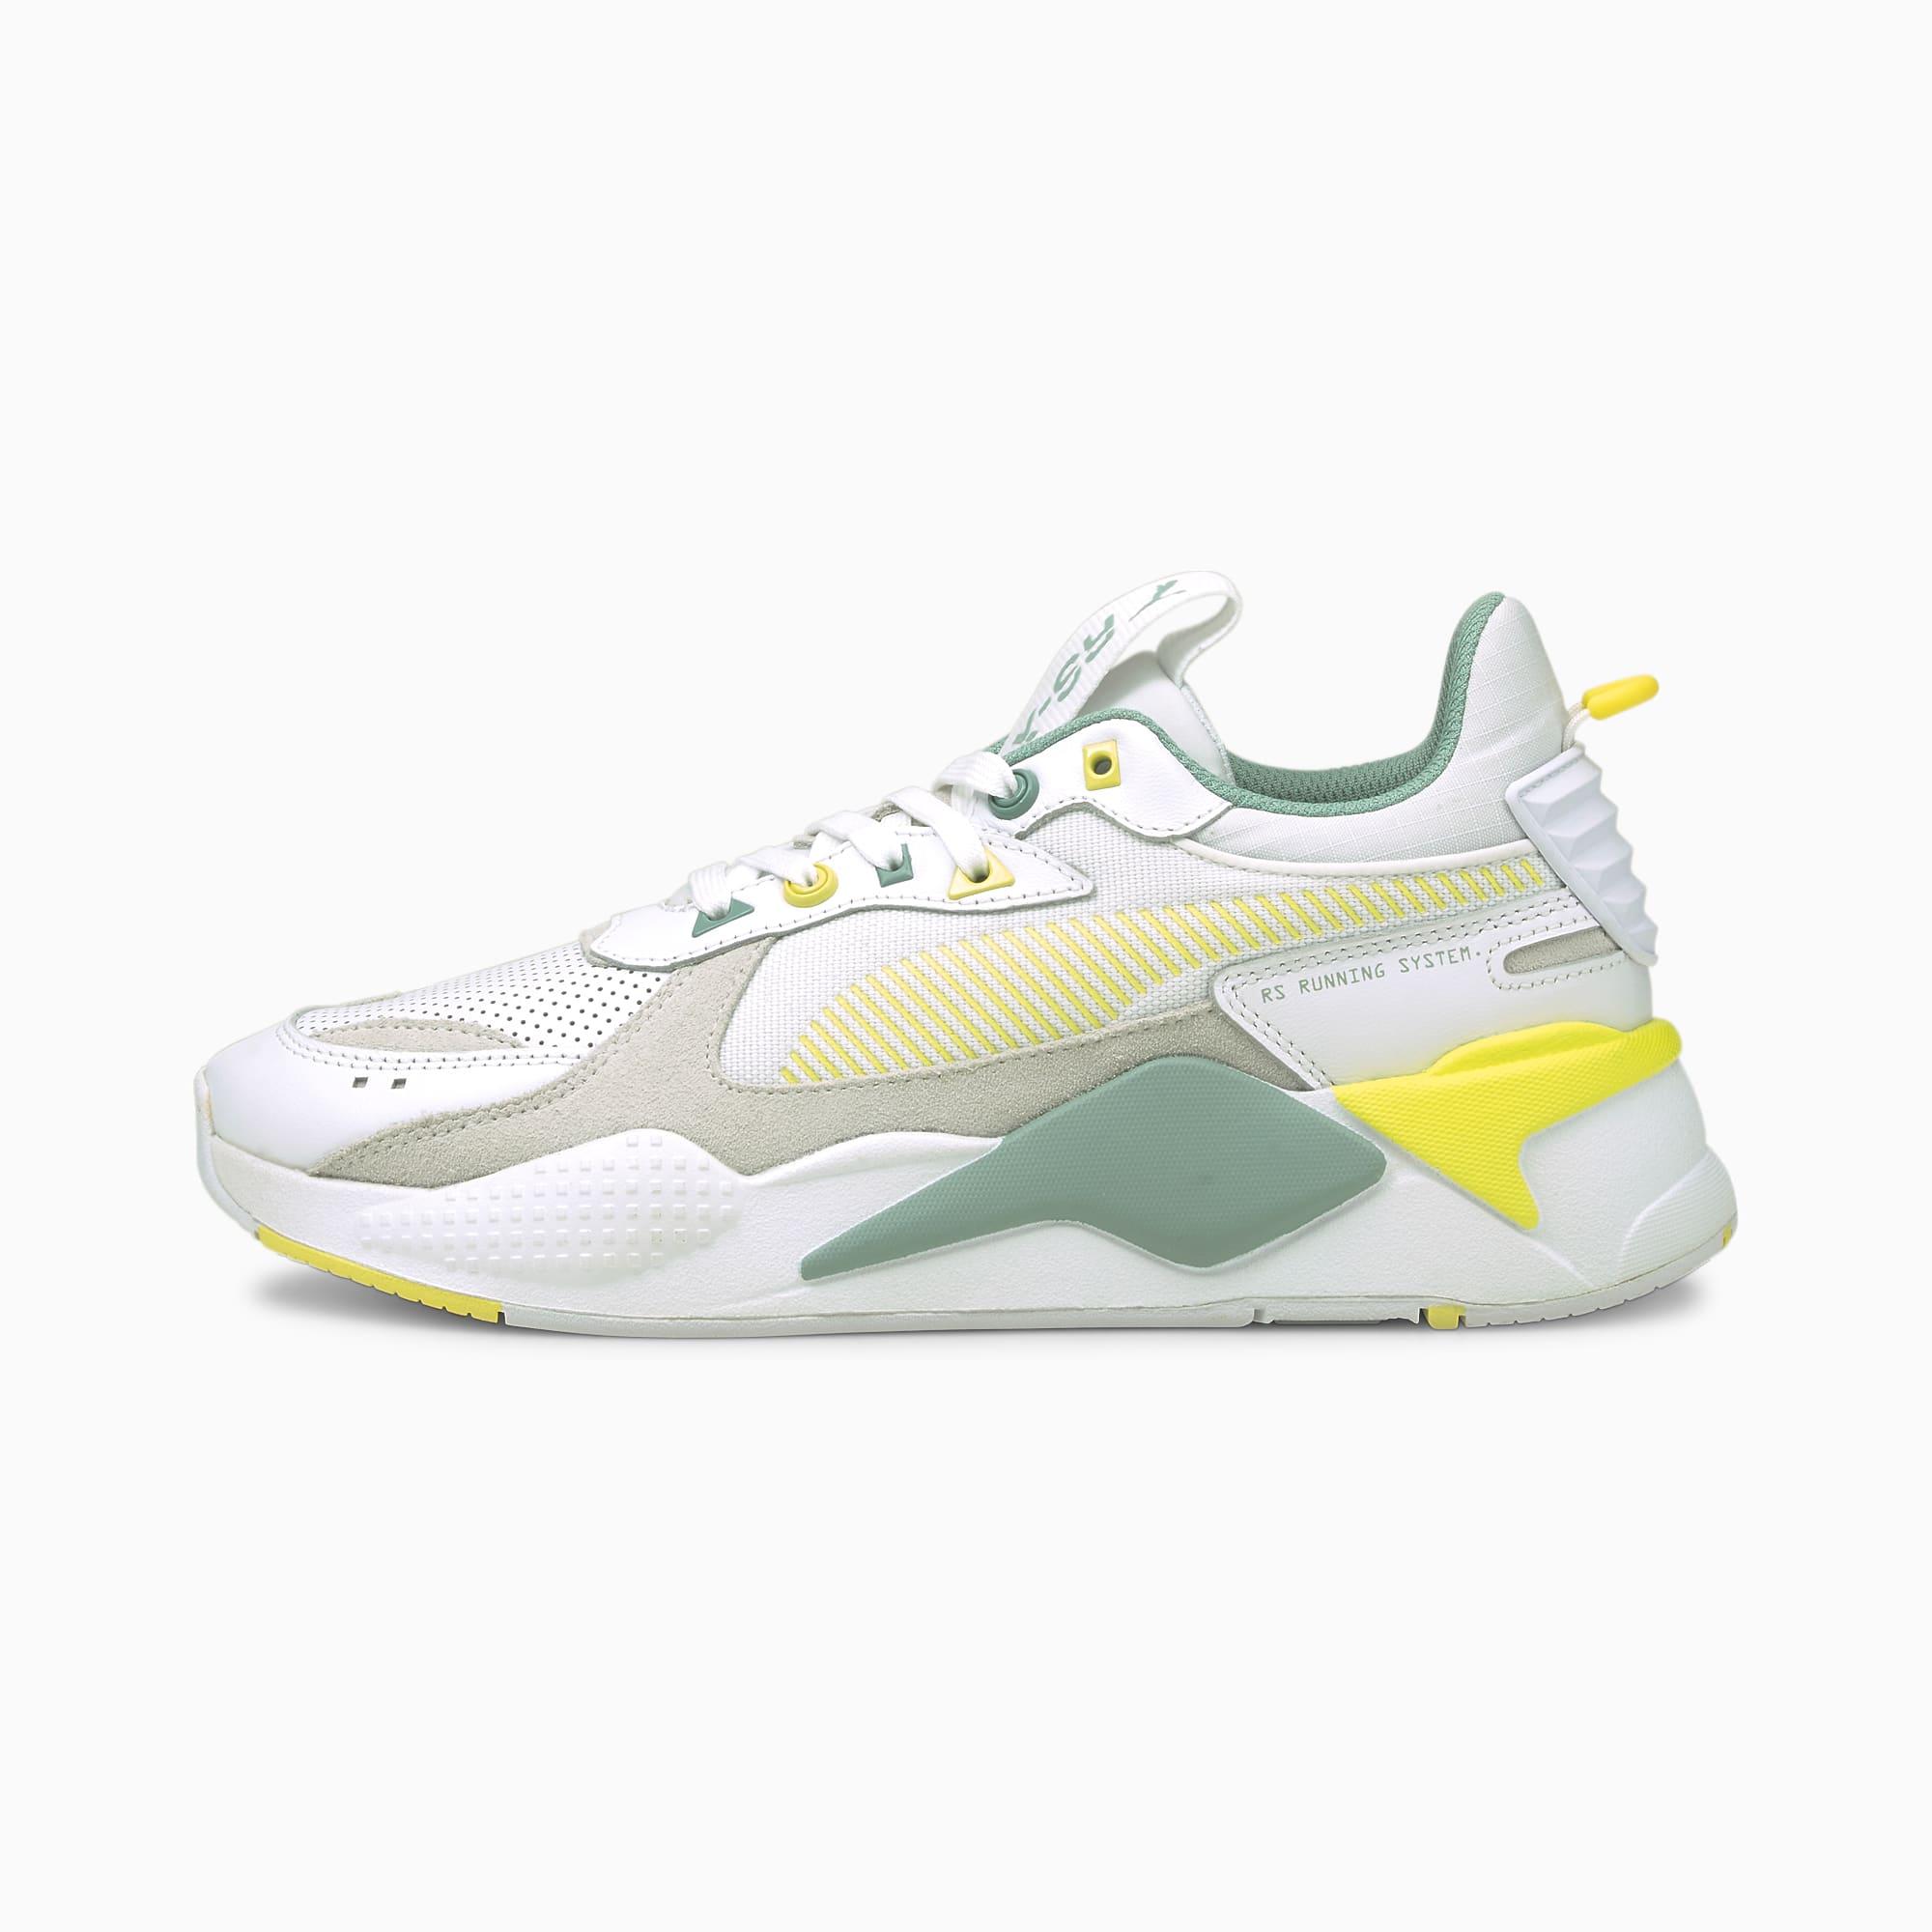 PUMA RS-X Colour Theory Sneaker Schuhe | Mit Aucun | Weiß | Größe: 37.5